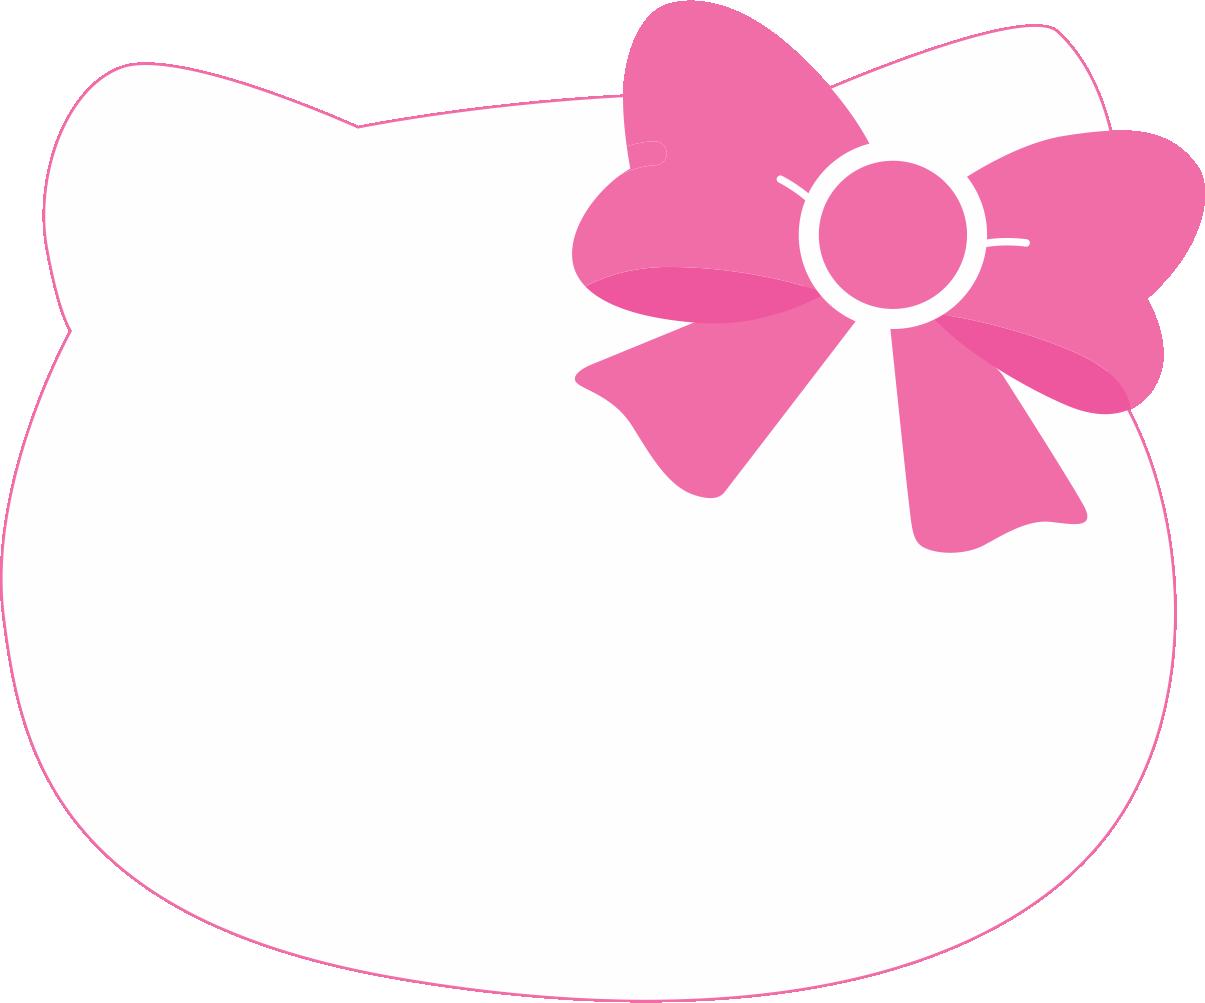 Hello-Kitty-Free-Printable-Mini-Kit-Oh-My-Fiesta-in-english-wallpaper-wp5405631